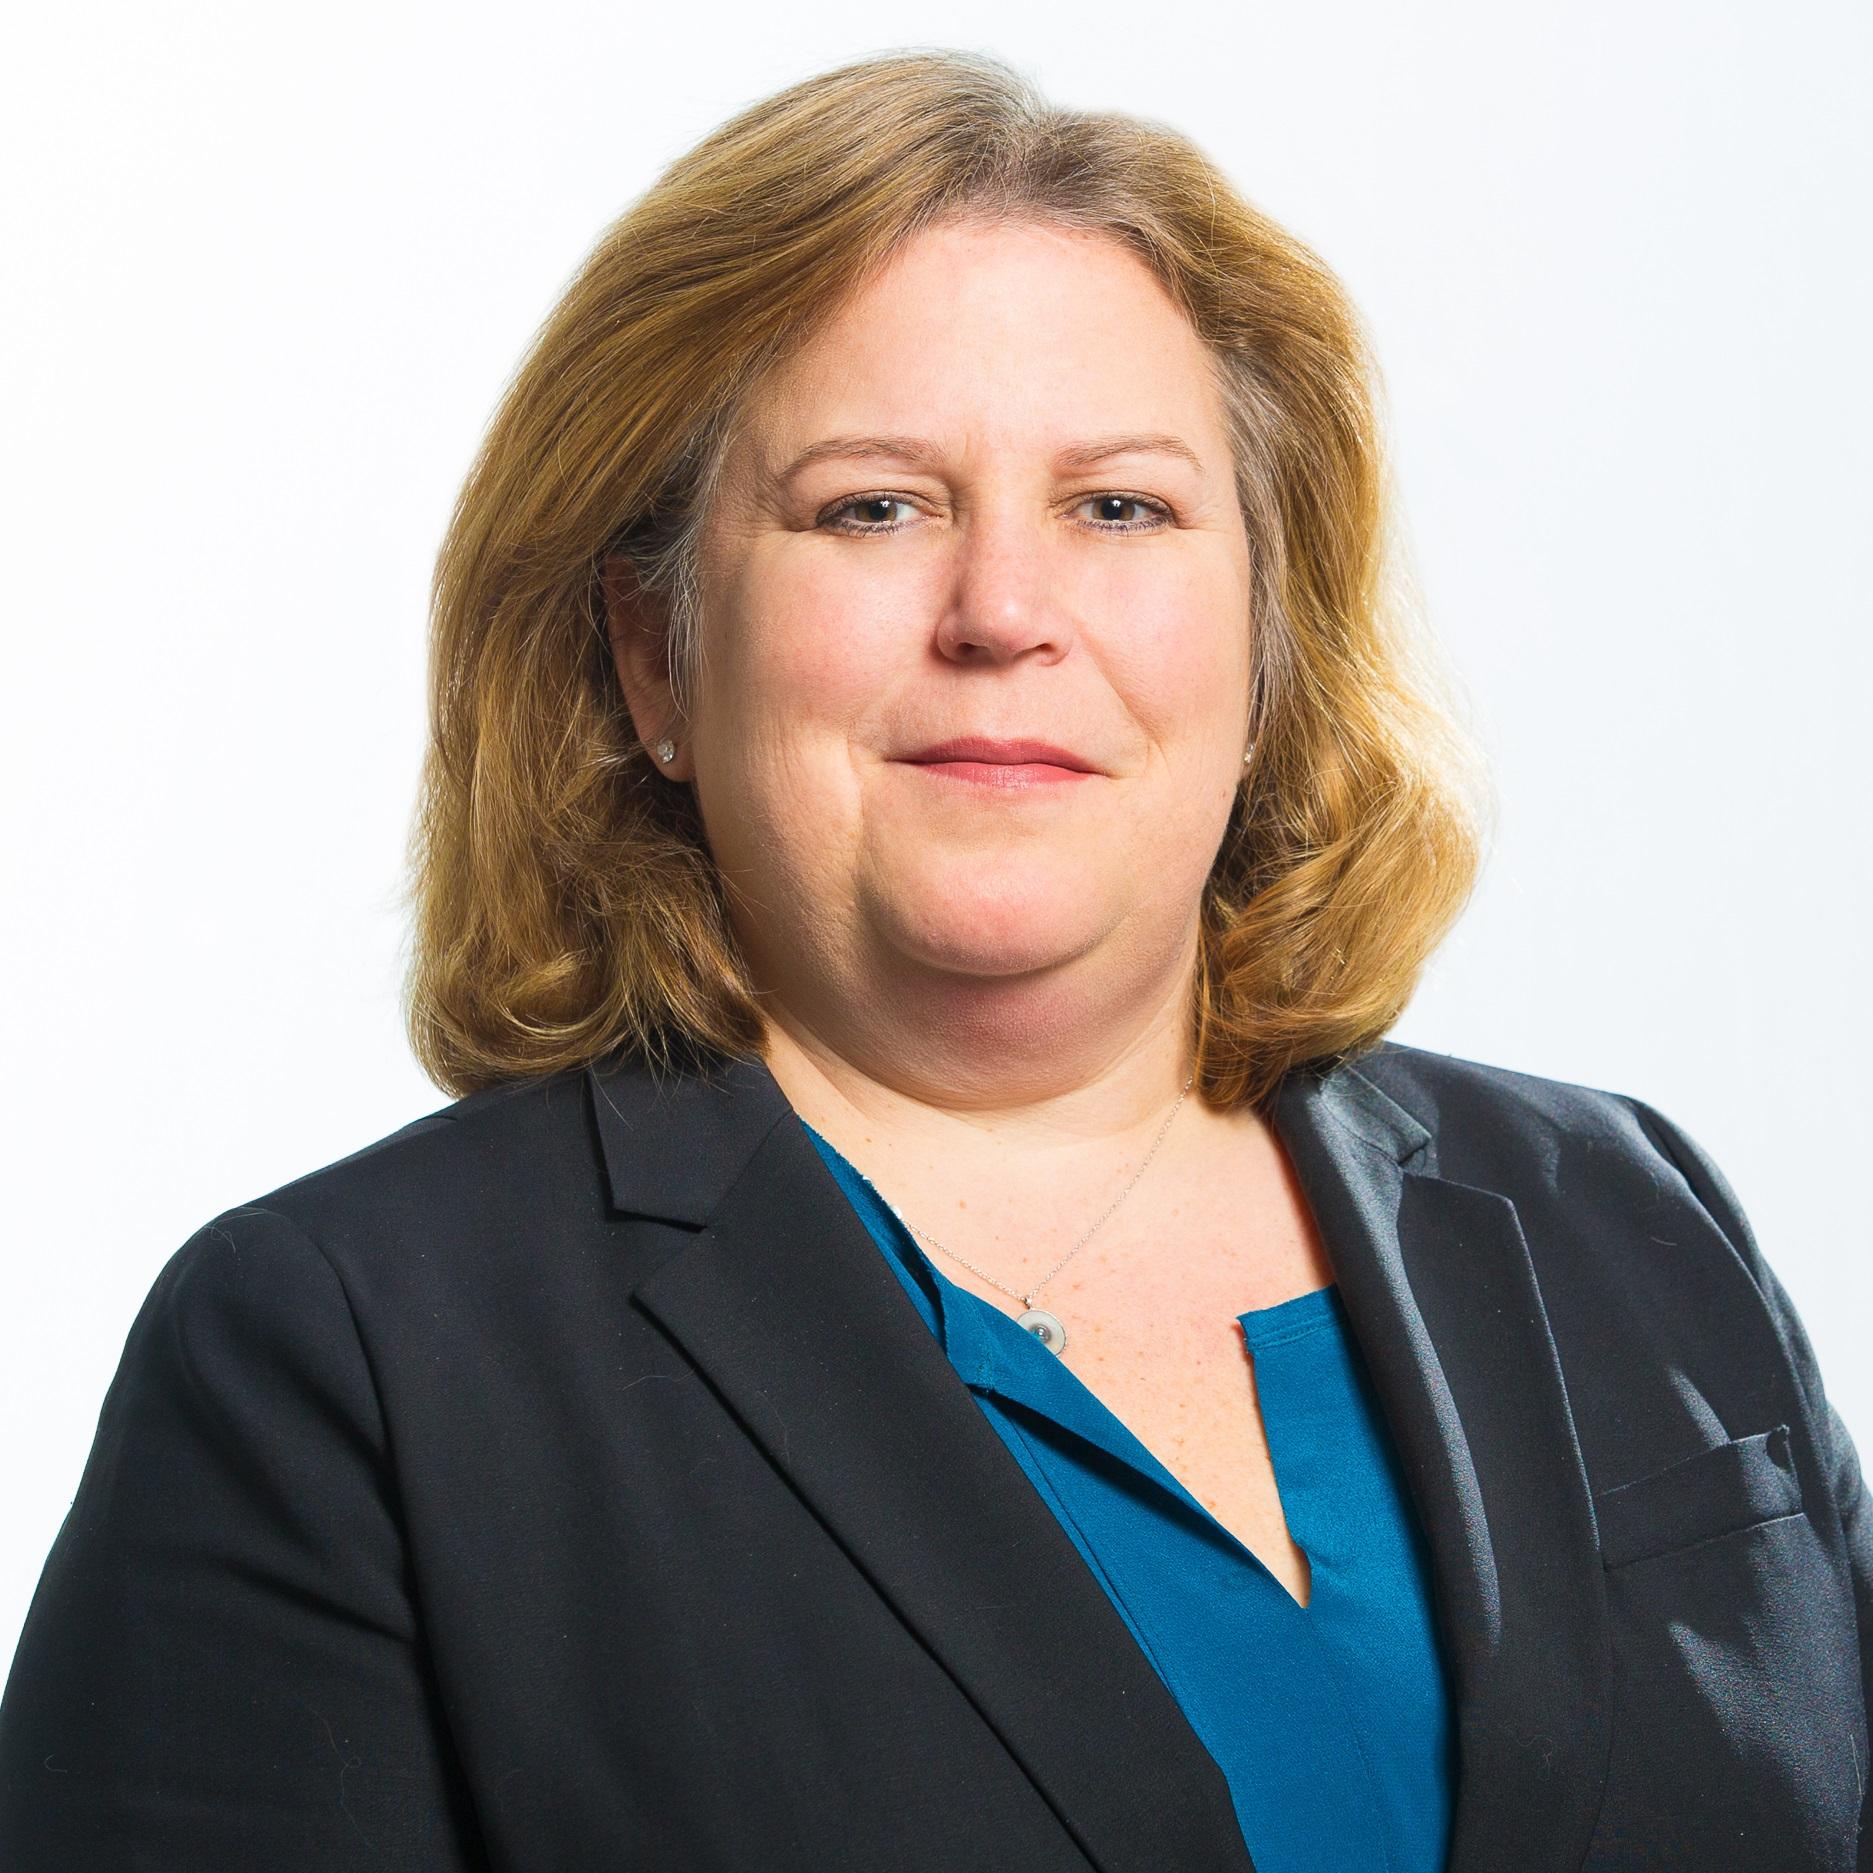 Karin Ford